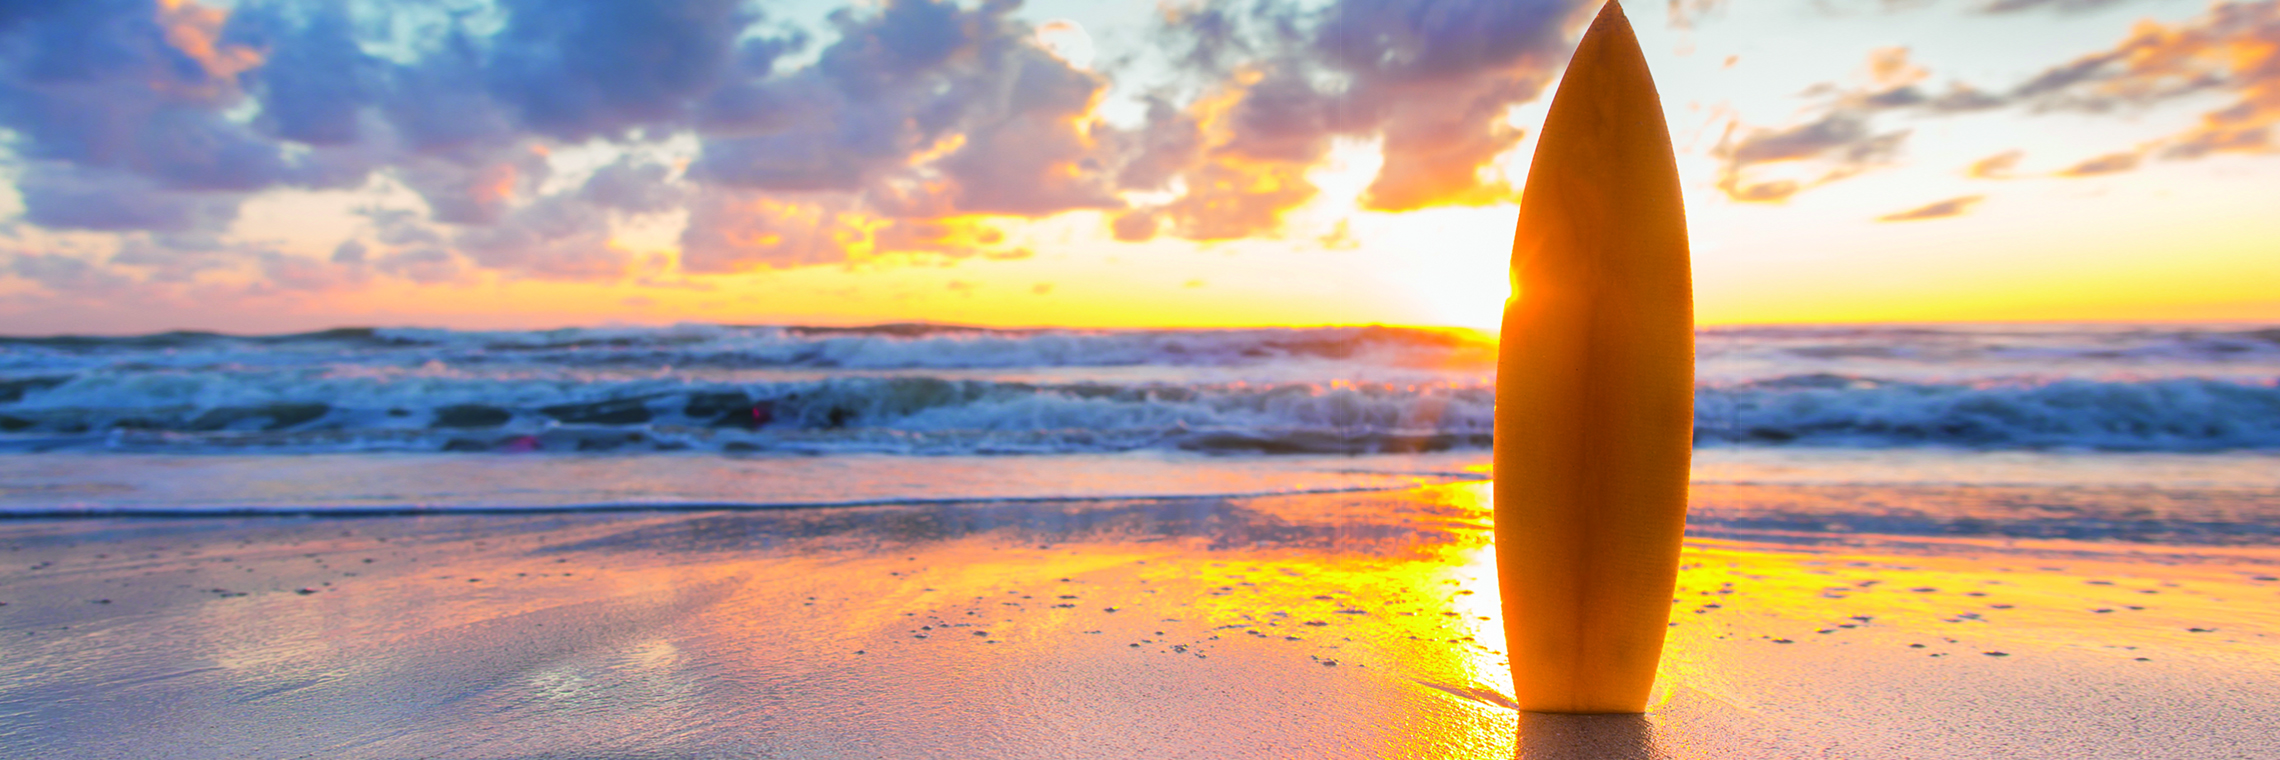 Surfboard-Bournemouth-Beach-Ben-Richardson-Marketing-Harker-and-Bullman-Letting-agents-meet-the-team